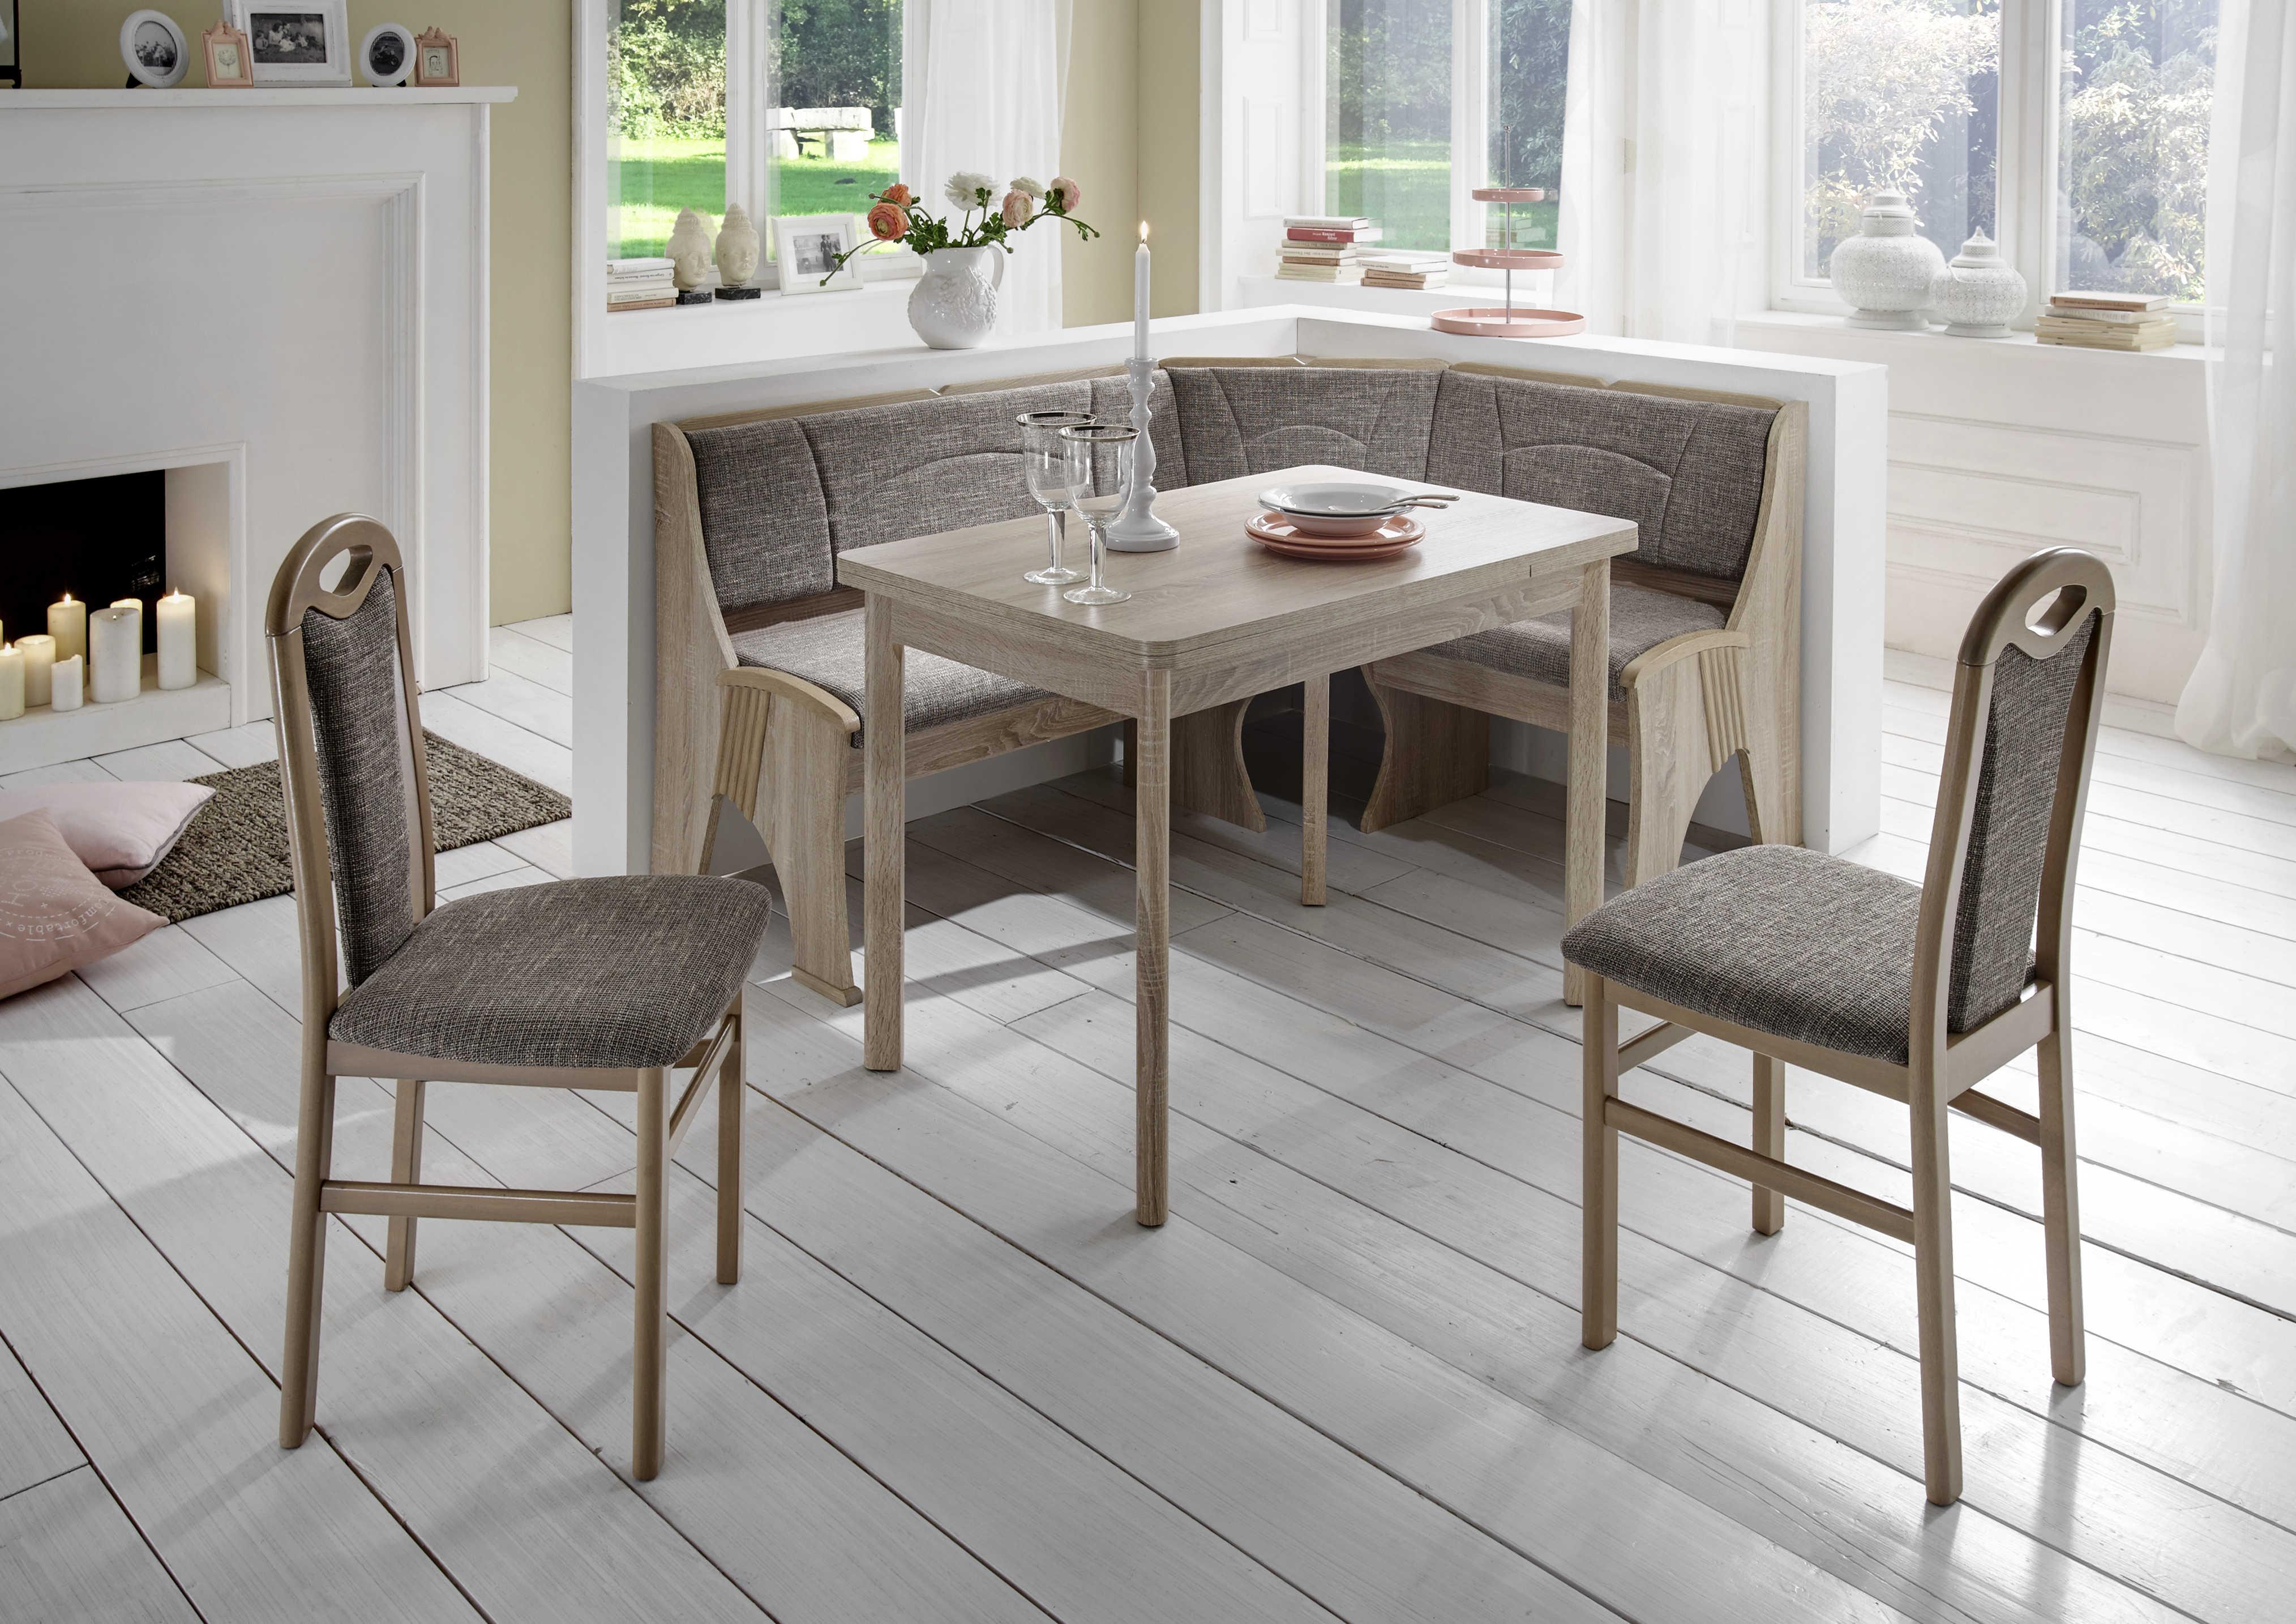 eckbank mit tisch rosenheim. Black Bedroom Furniture Sets. Home Design Ideas